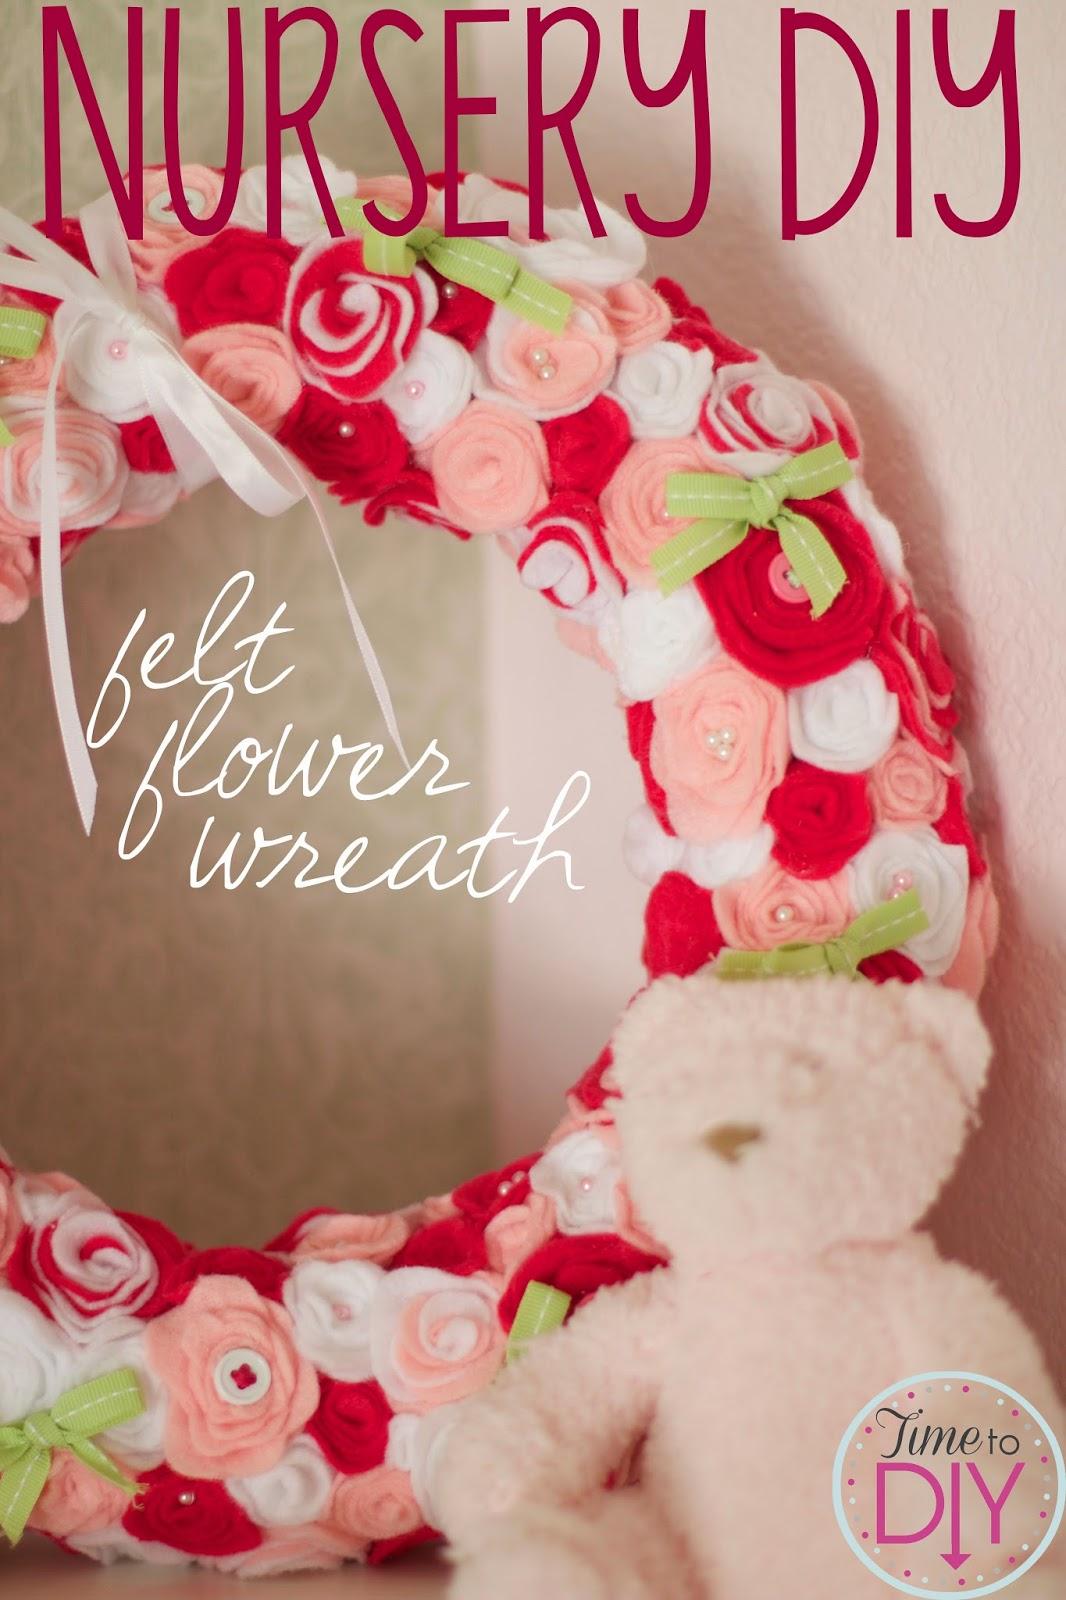 Nursery DIY: felt flower wreath and pink baby shower